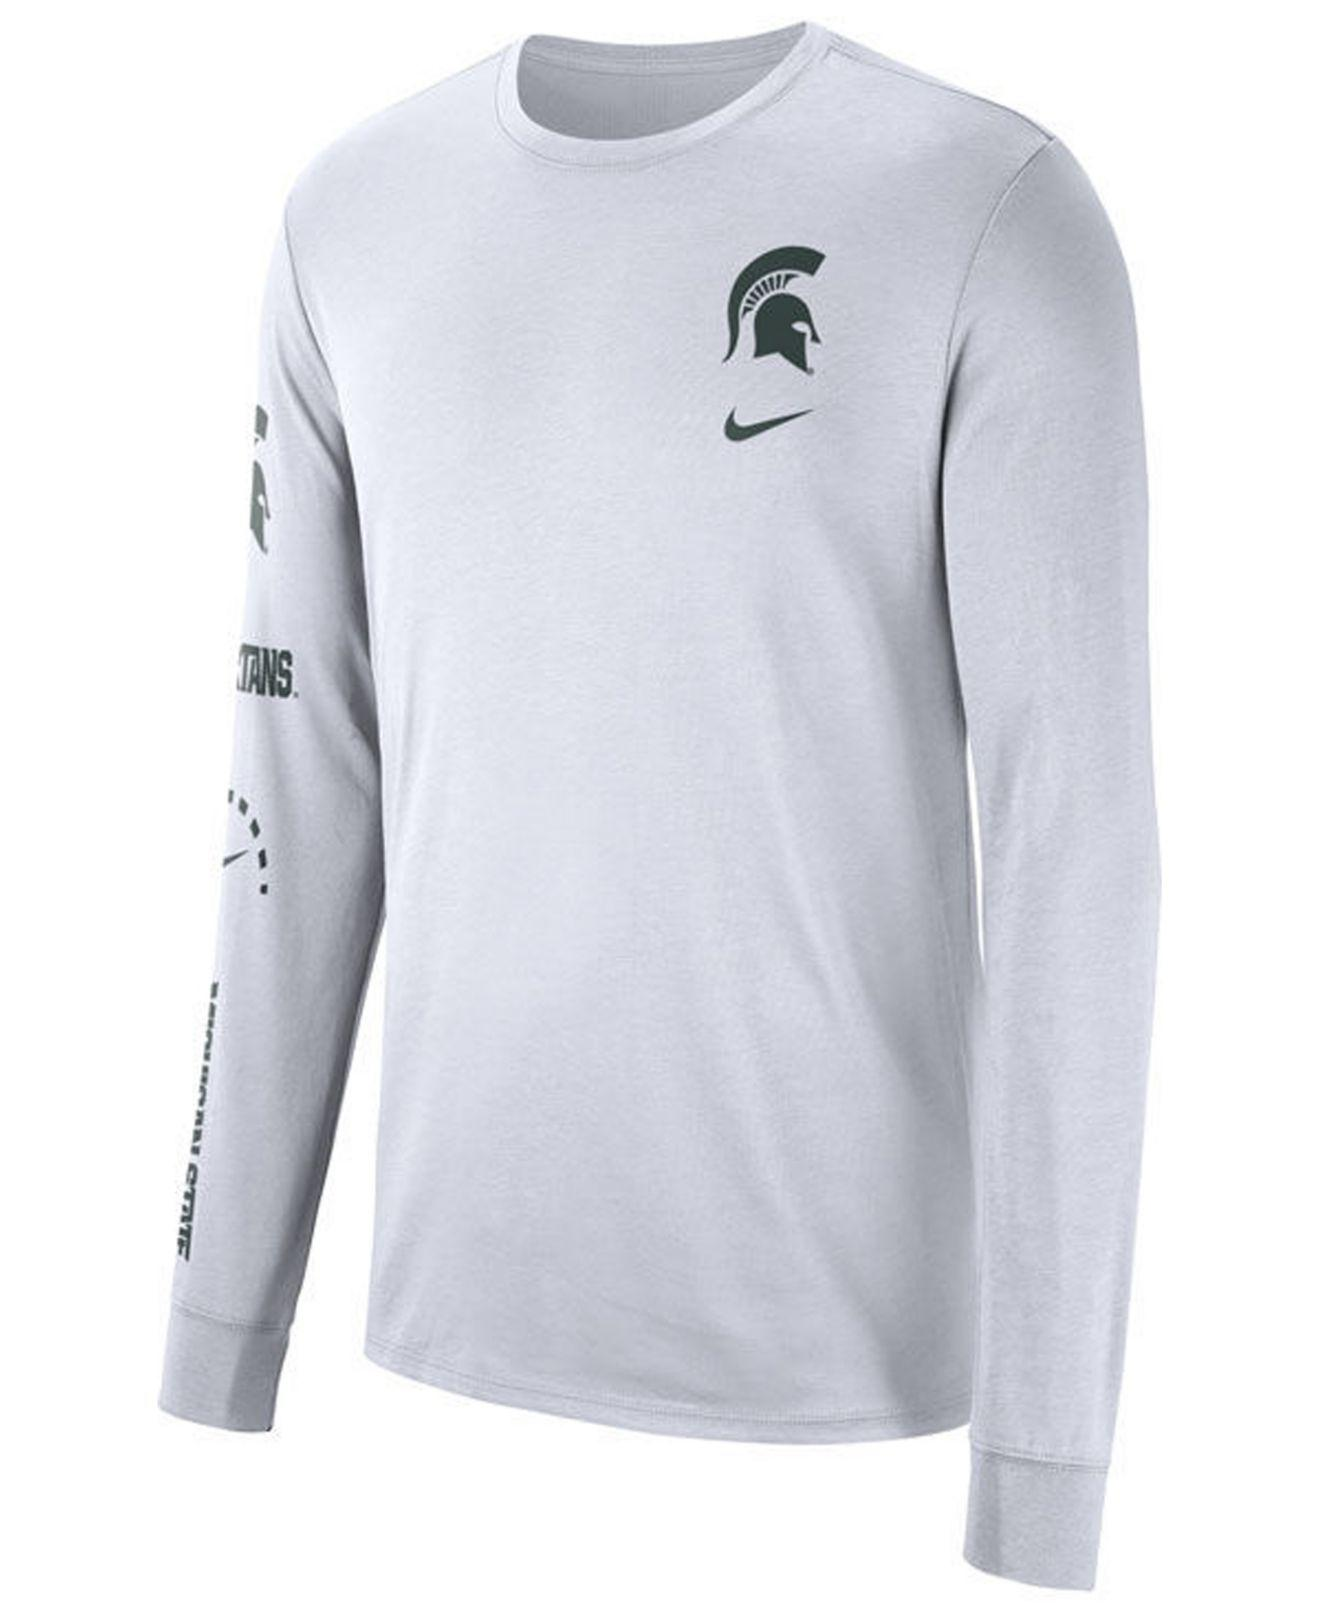 15c472234fa Nike. Men s White Michigan State Spartans Long Sleeve Basketball T-shirt